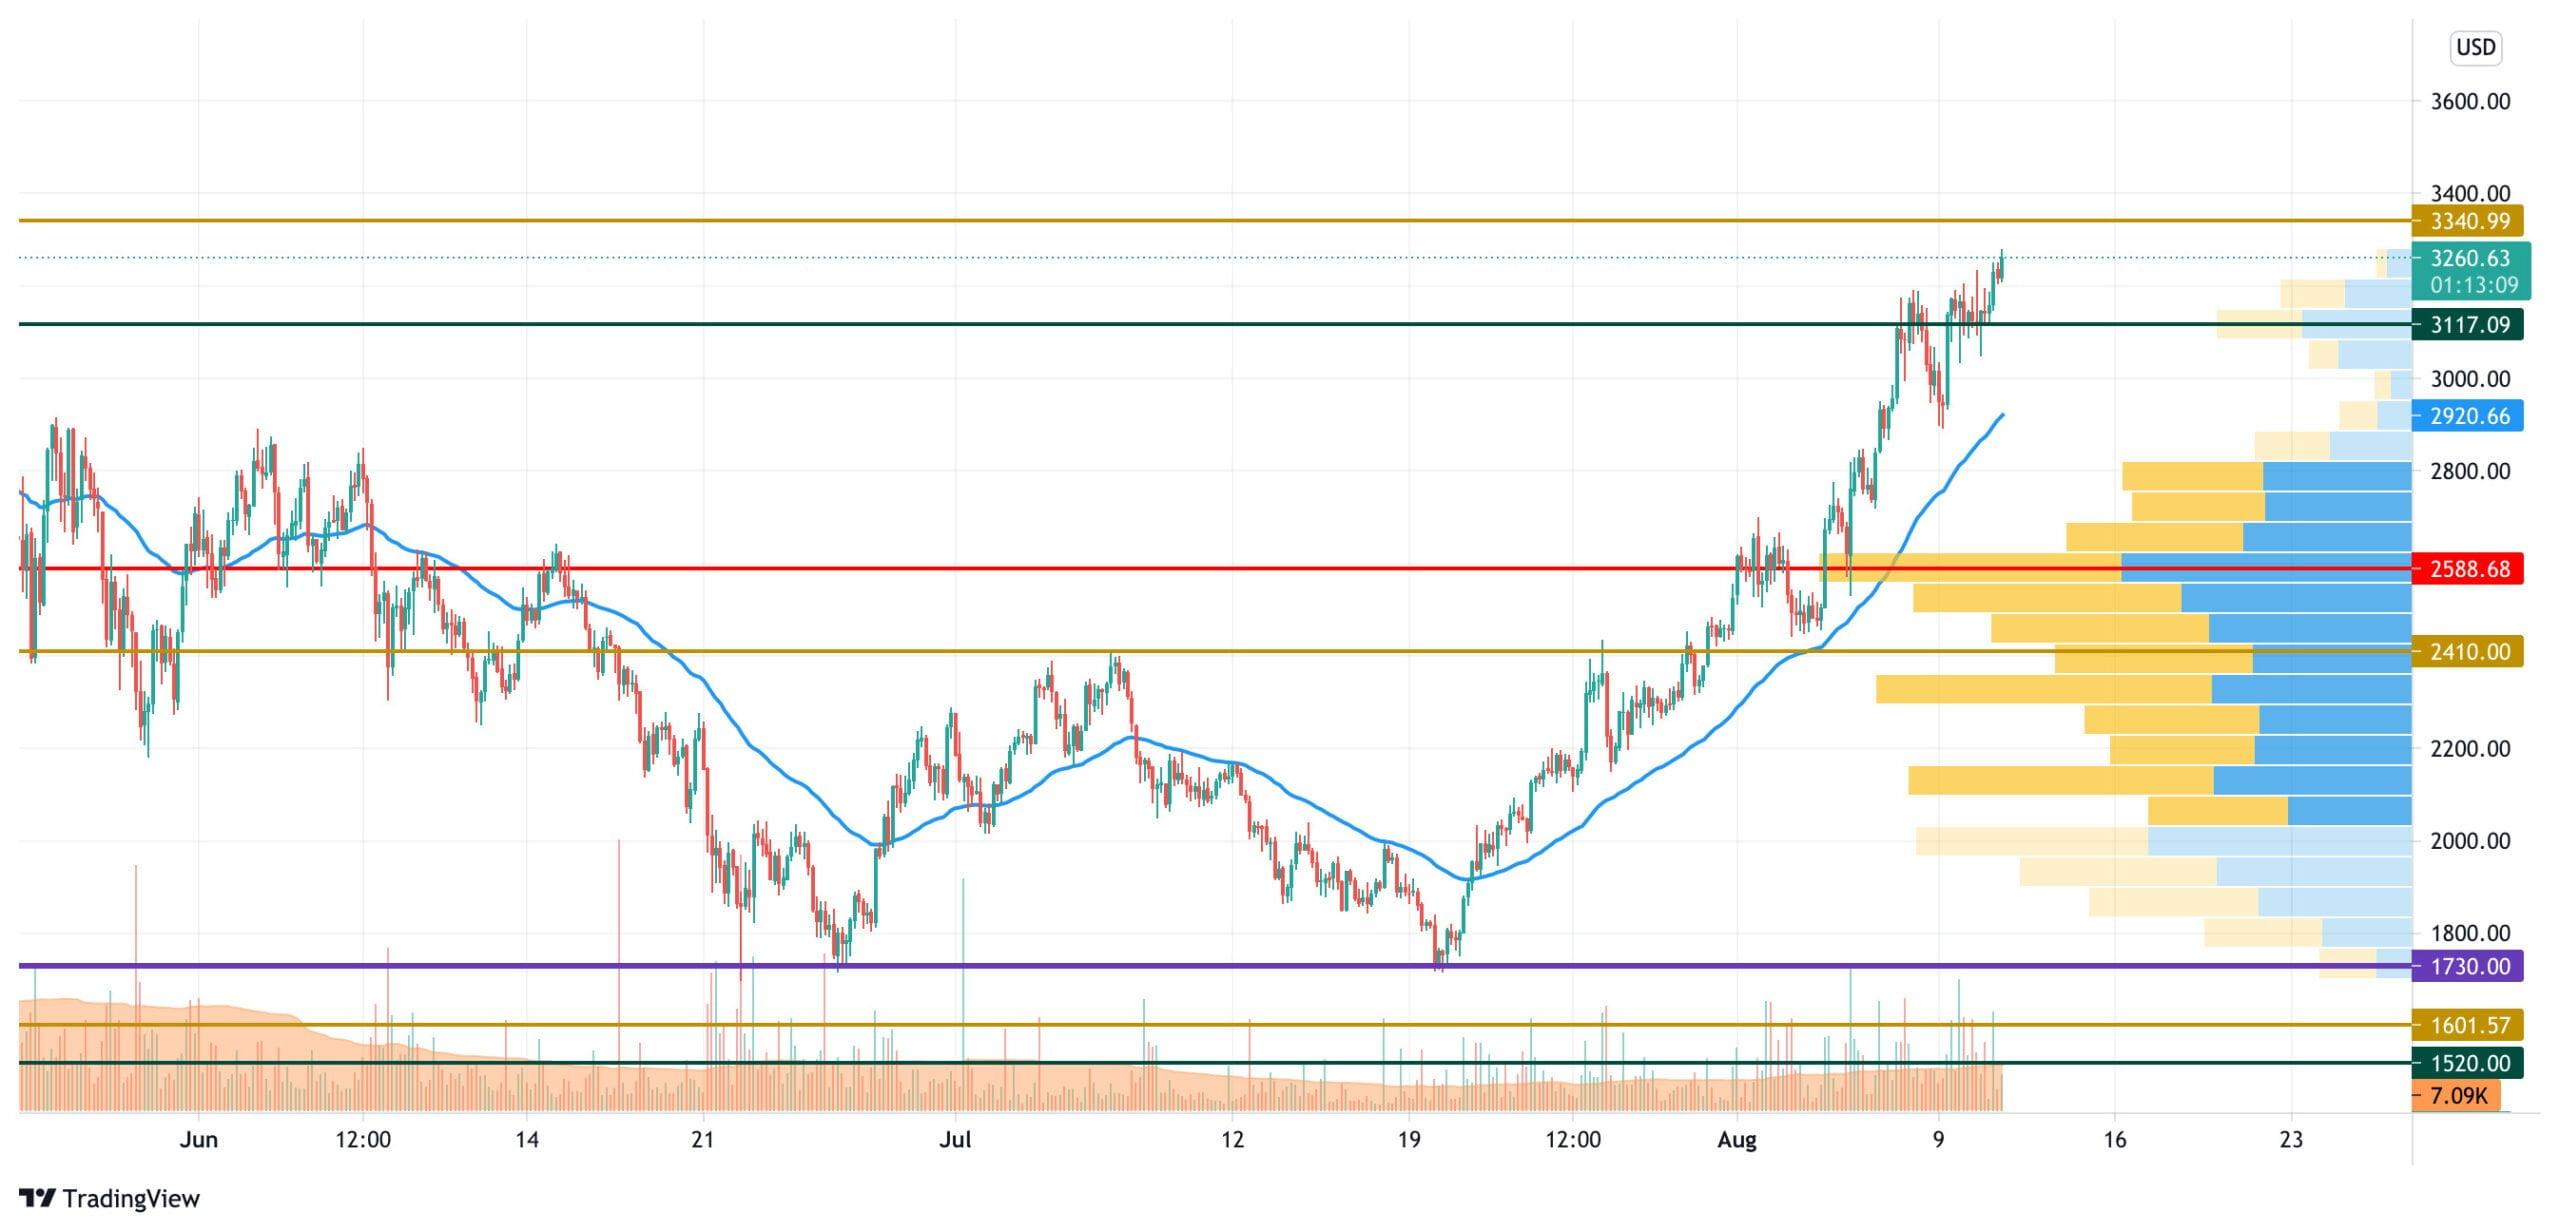 11 Ağustos Kripto Para Fiyat Analizi: BTC, ETH ve XRP 3 - 11 agustos kripto para fiyat analizi btc eth ve xrp 3 scaled